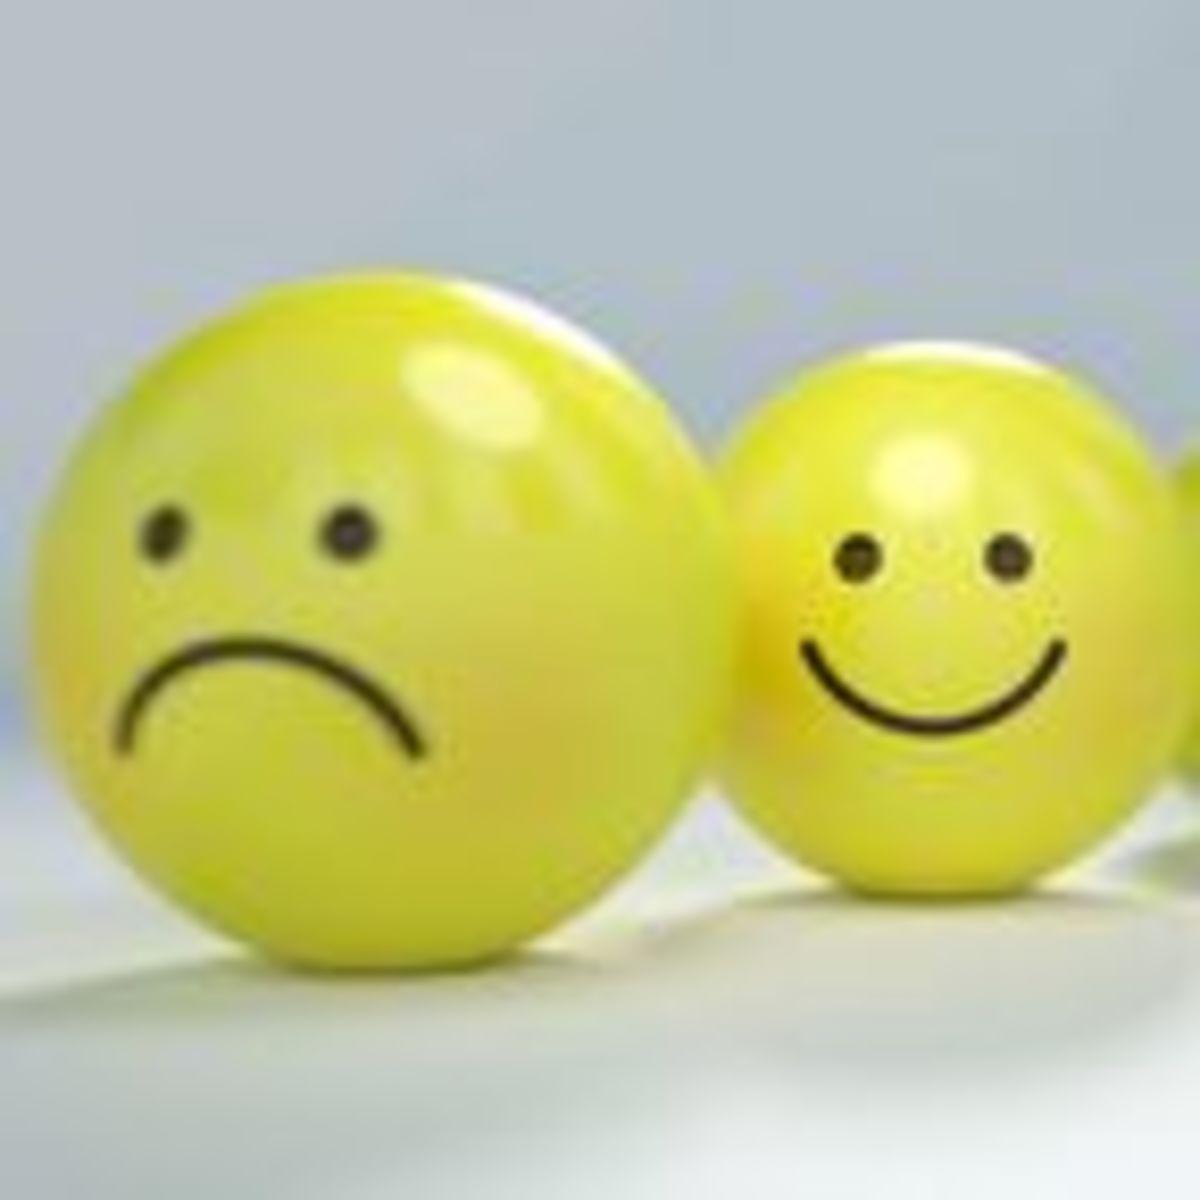 Four Ways to Improve Self-Esteem | Psychology Today Ireland